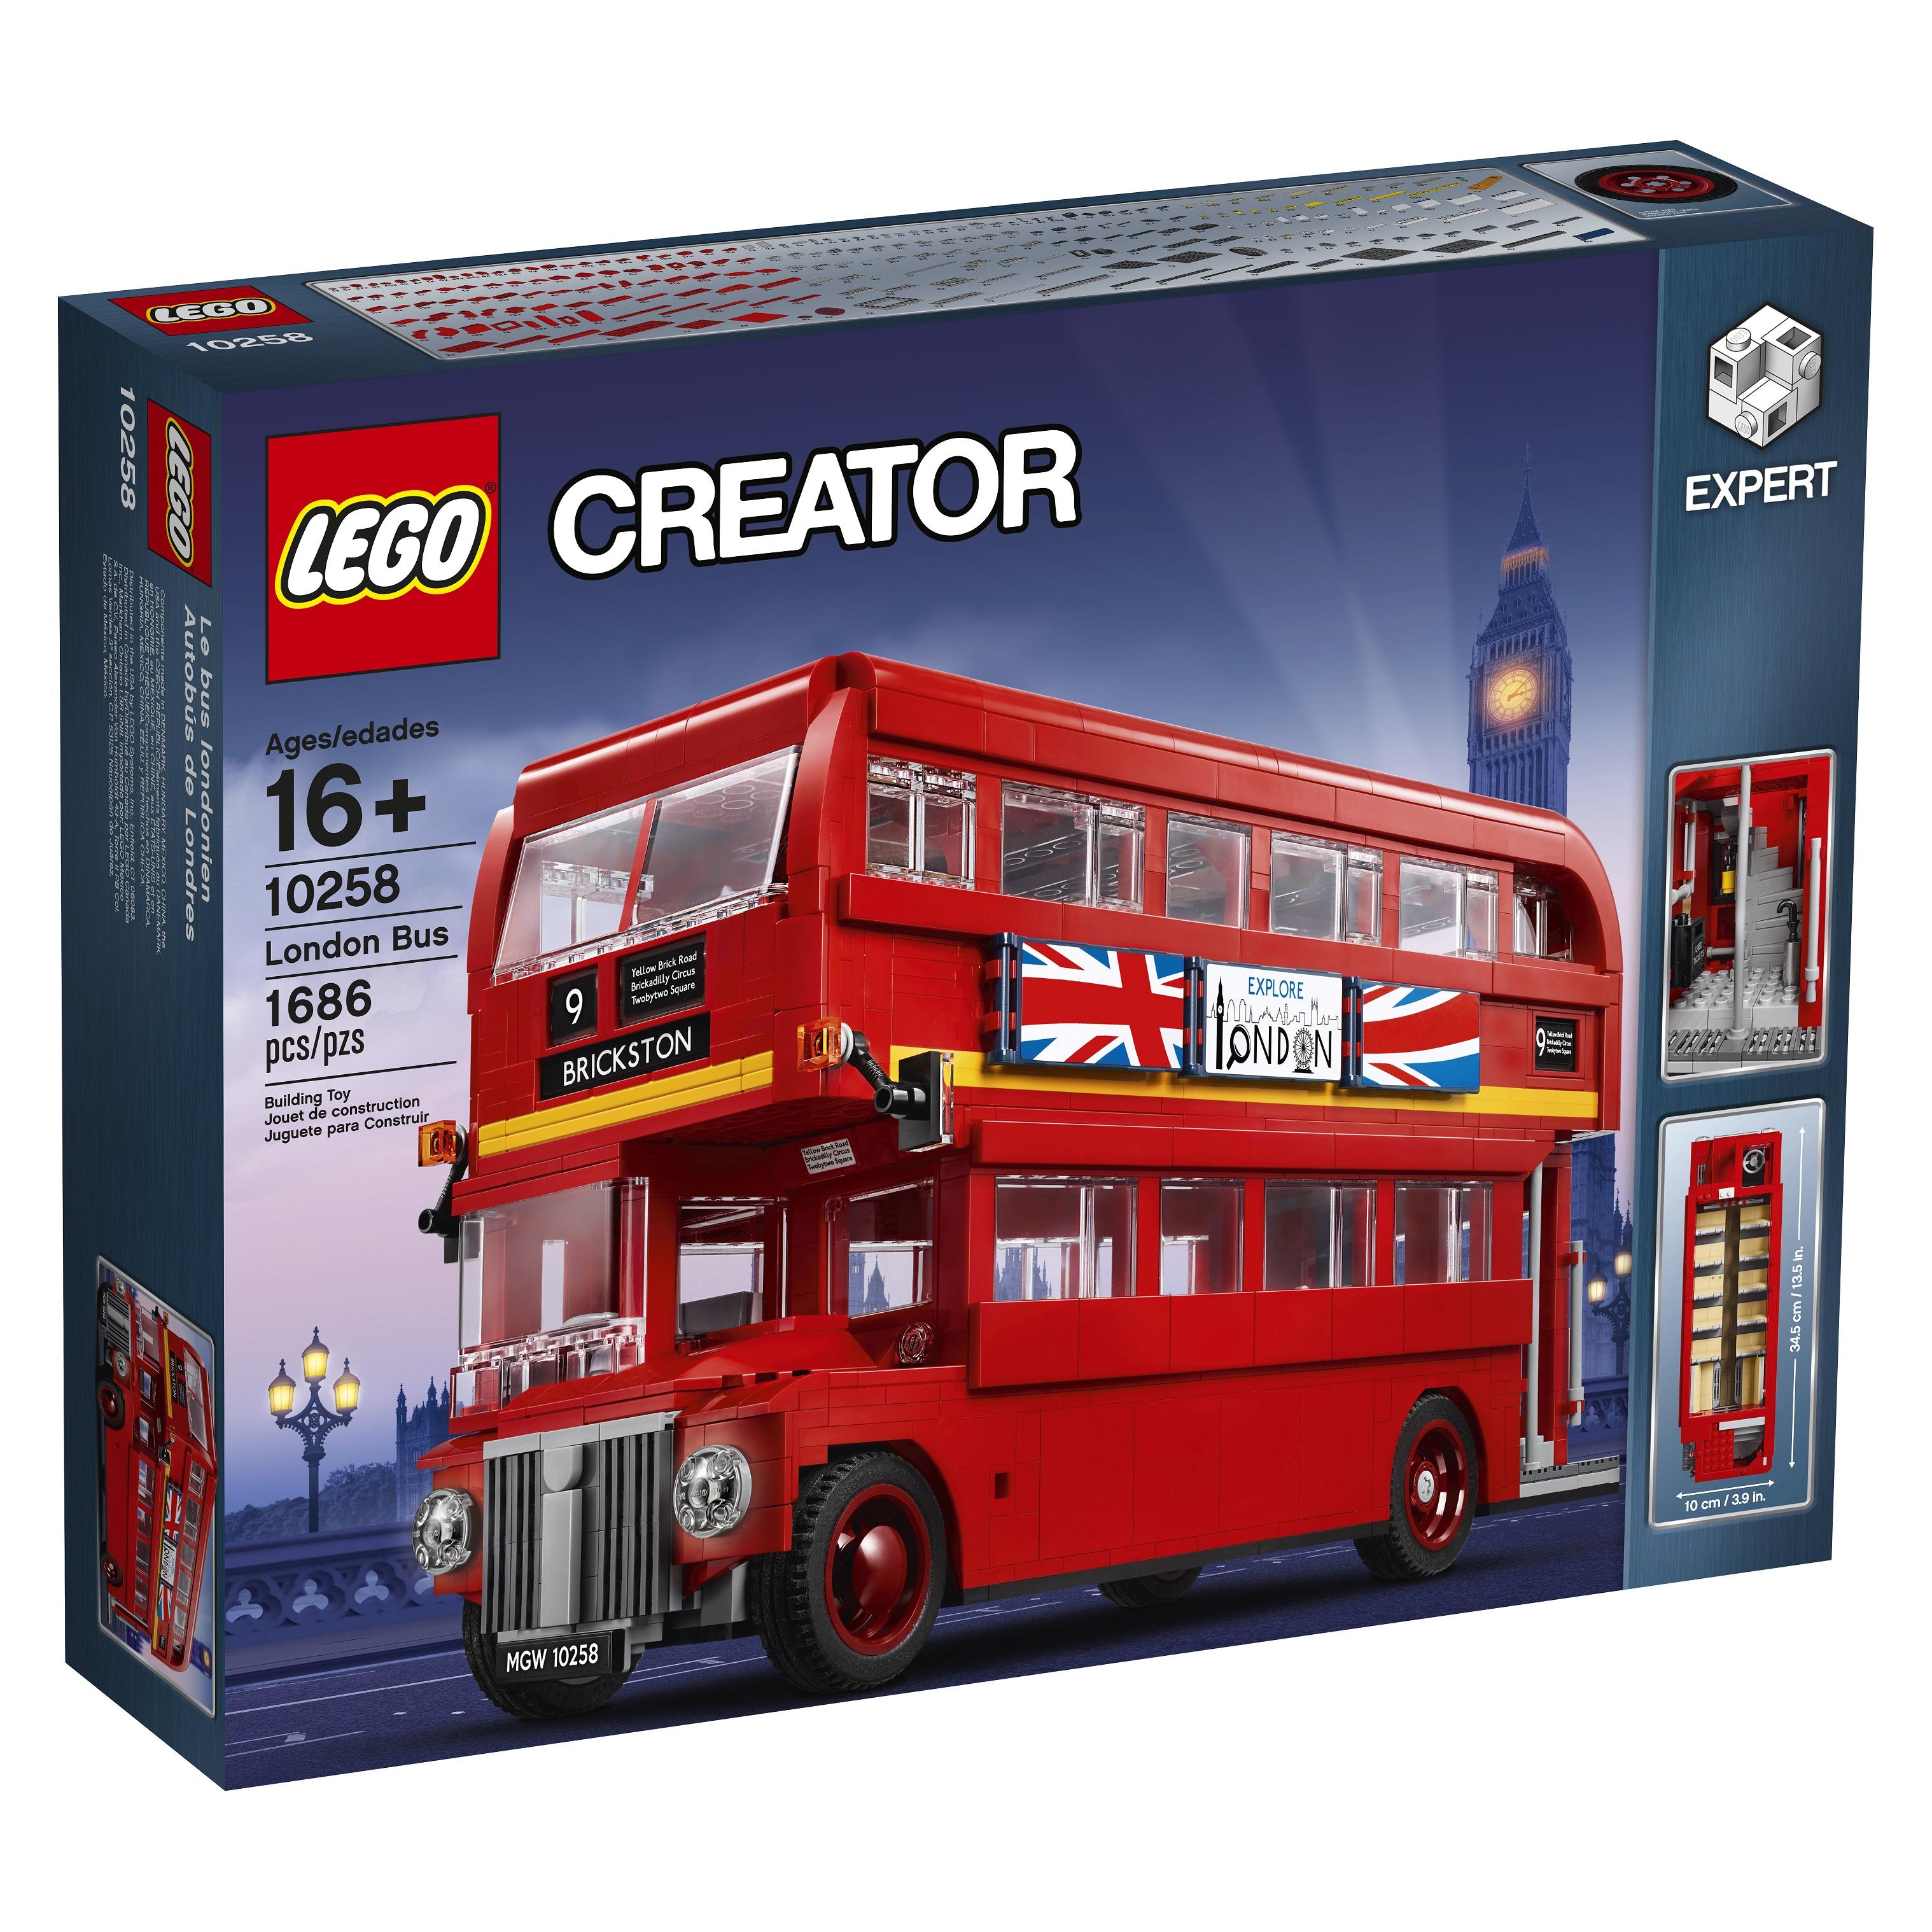 all aboard the lego creator expert 10258 london bus. Black Bedroom Furniture Sets. Home Design Ideas